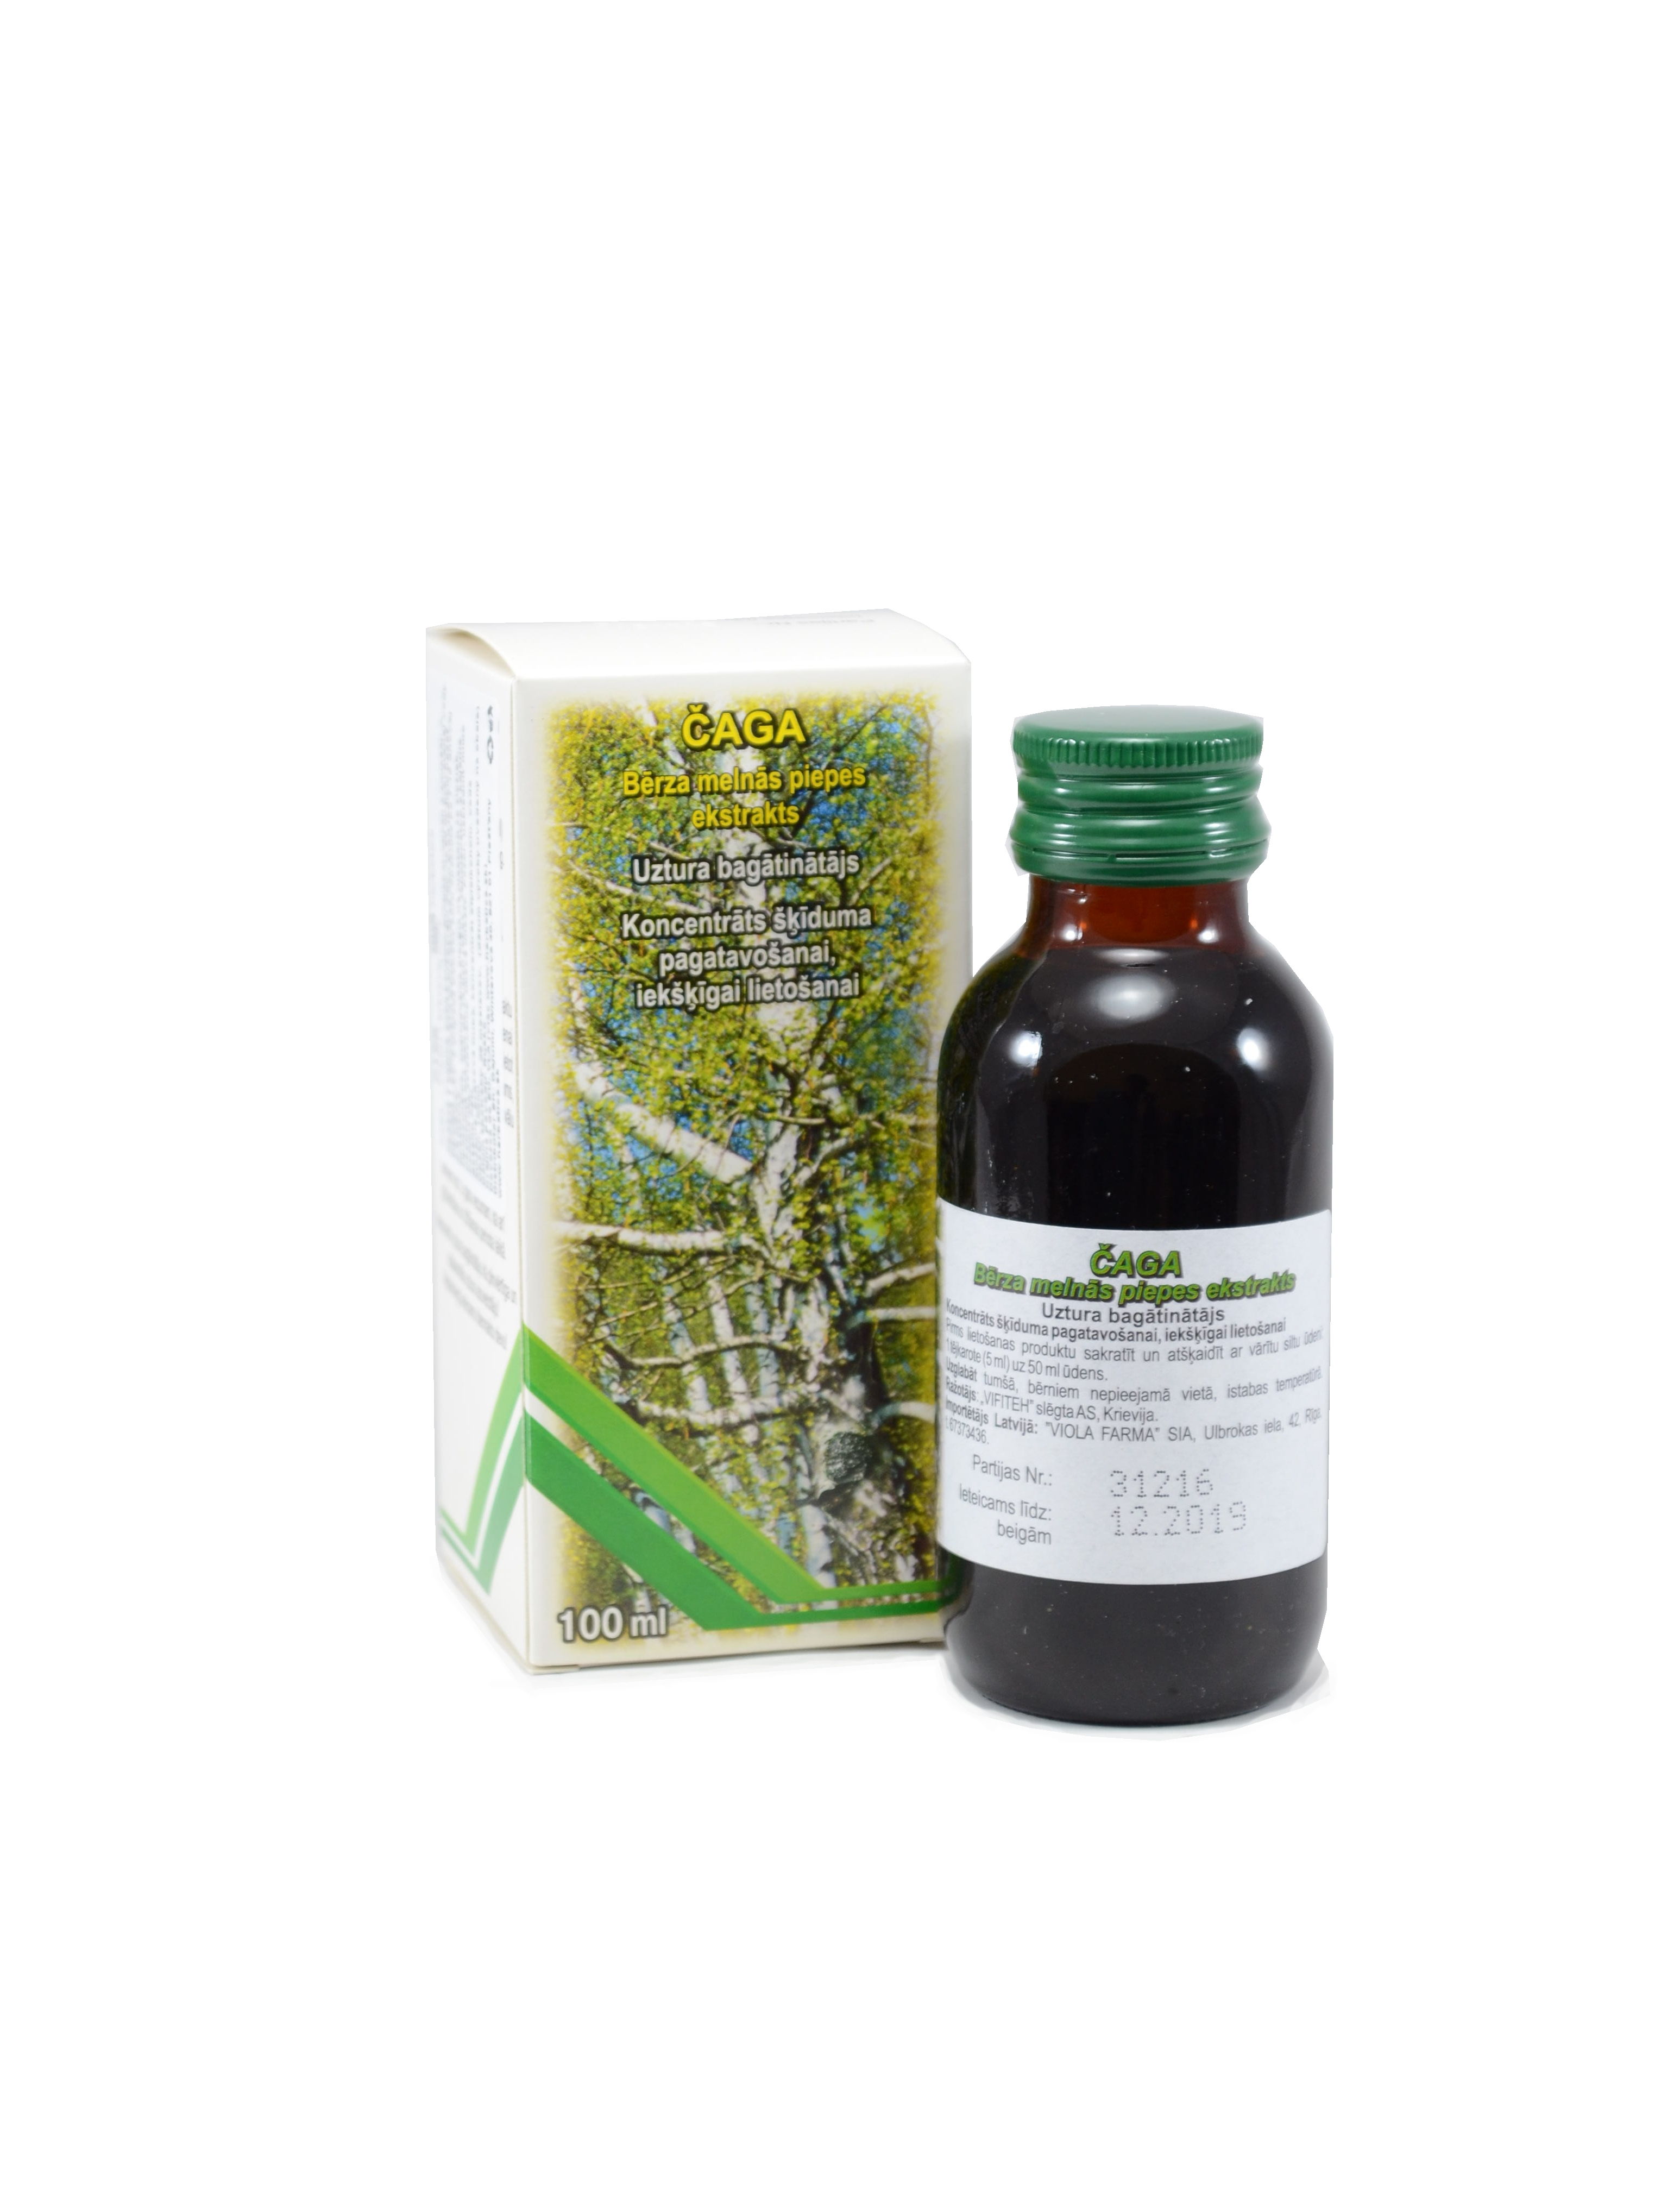 Vifitex ČAGA – extrakt z brezovej huby - 100 ml